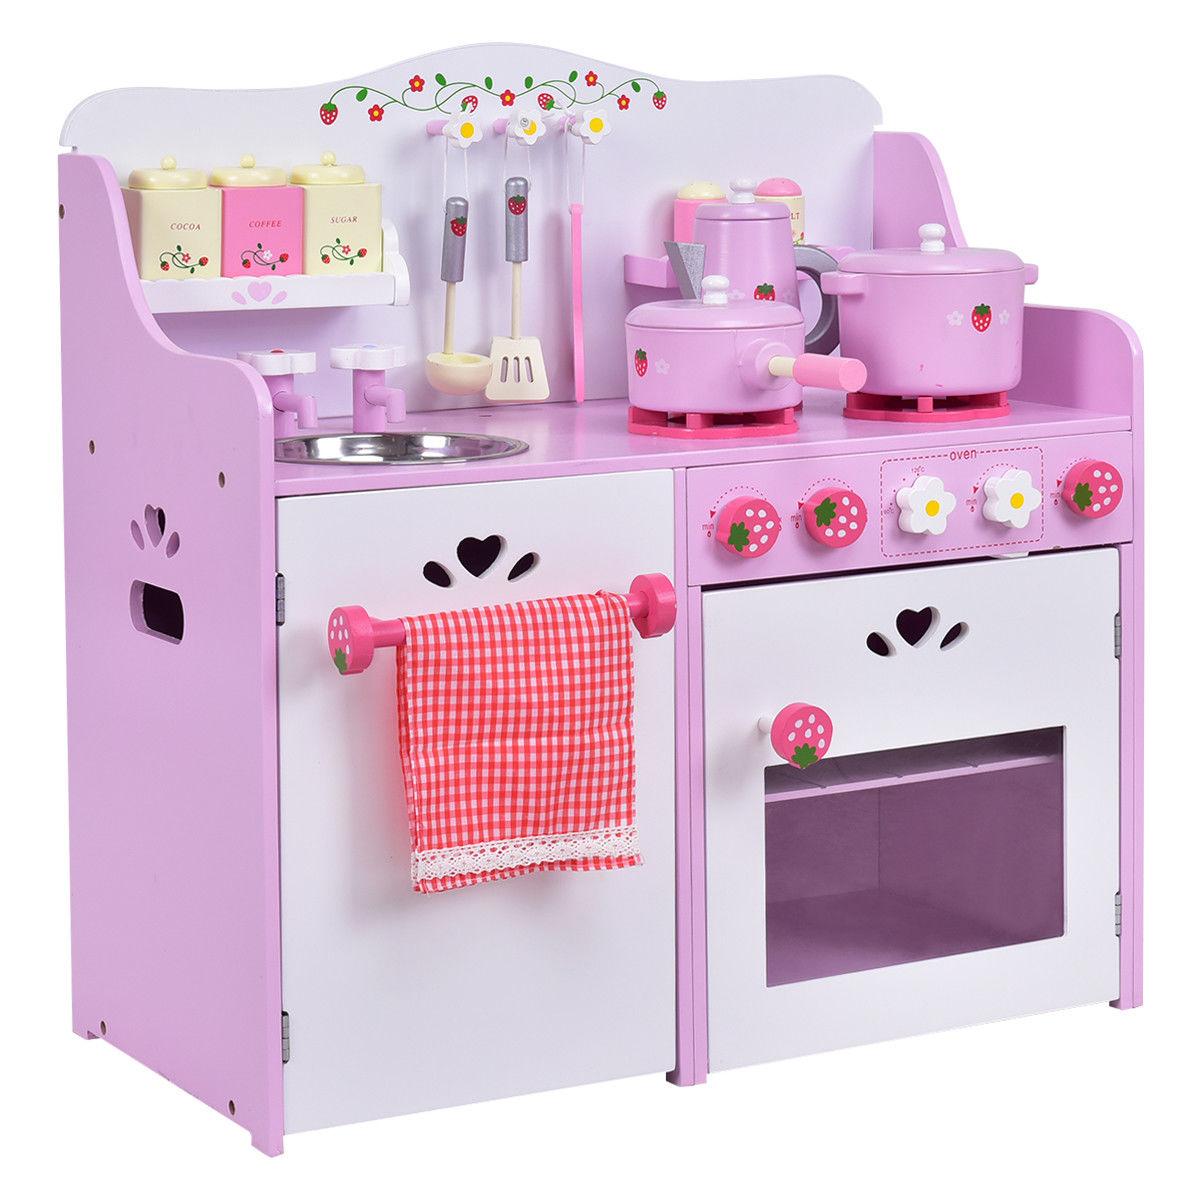 Costway Kids Wooden Play Set Kitchen Toy Strawberry Pretend Cooking Playset Toddler Walmart Com Walmart Com